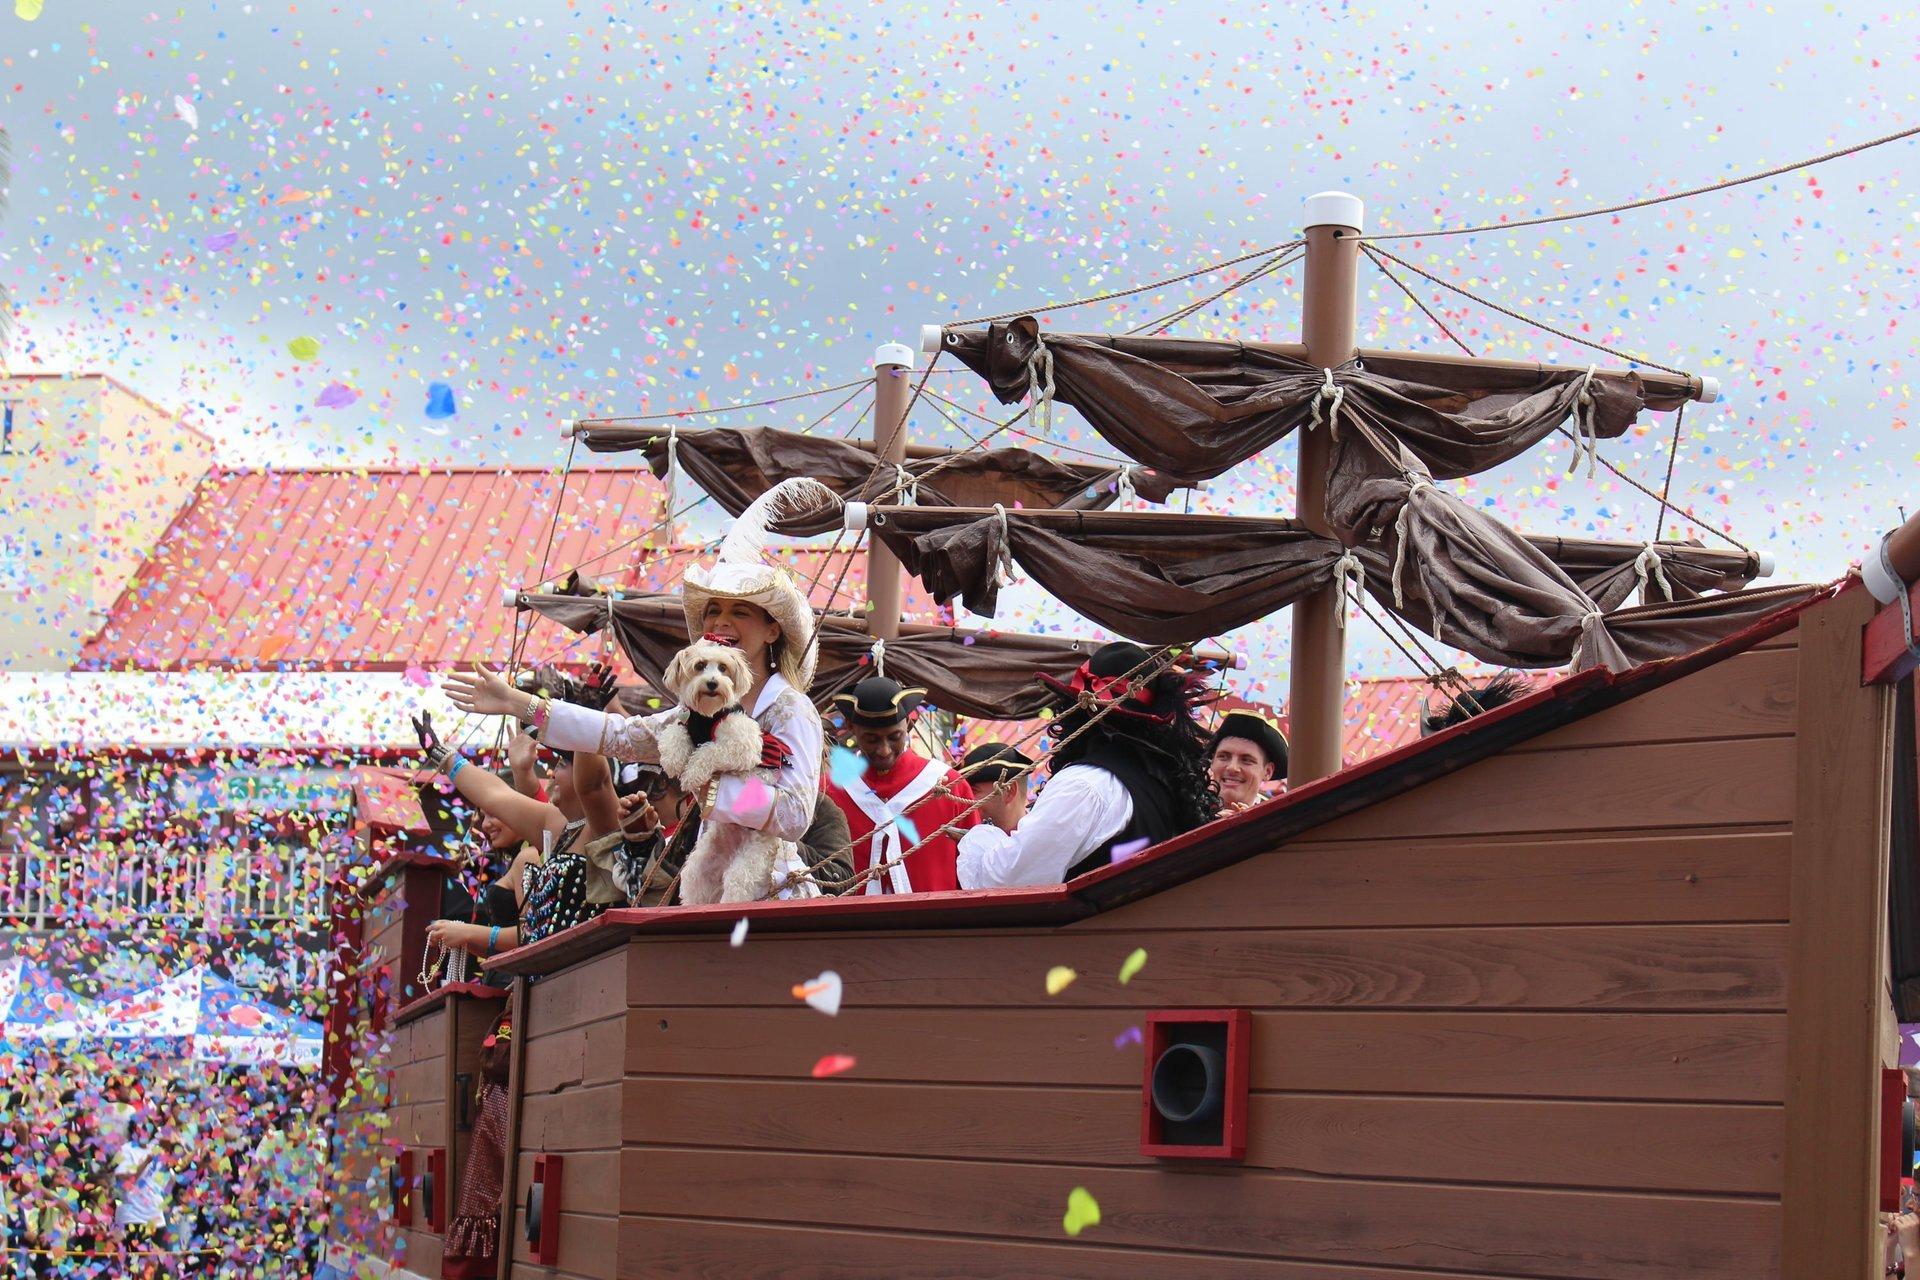 Cayman Islands Pirates Week Festival in Cayman Islands 2020 - Best Time